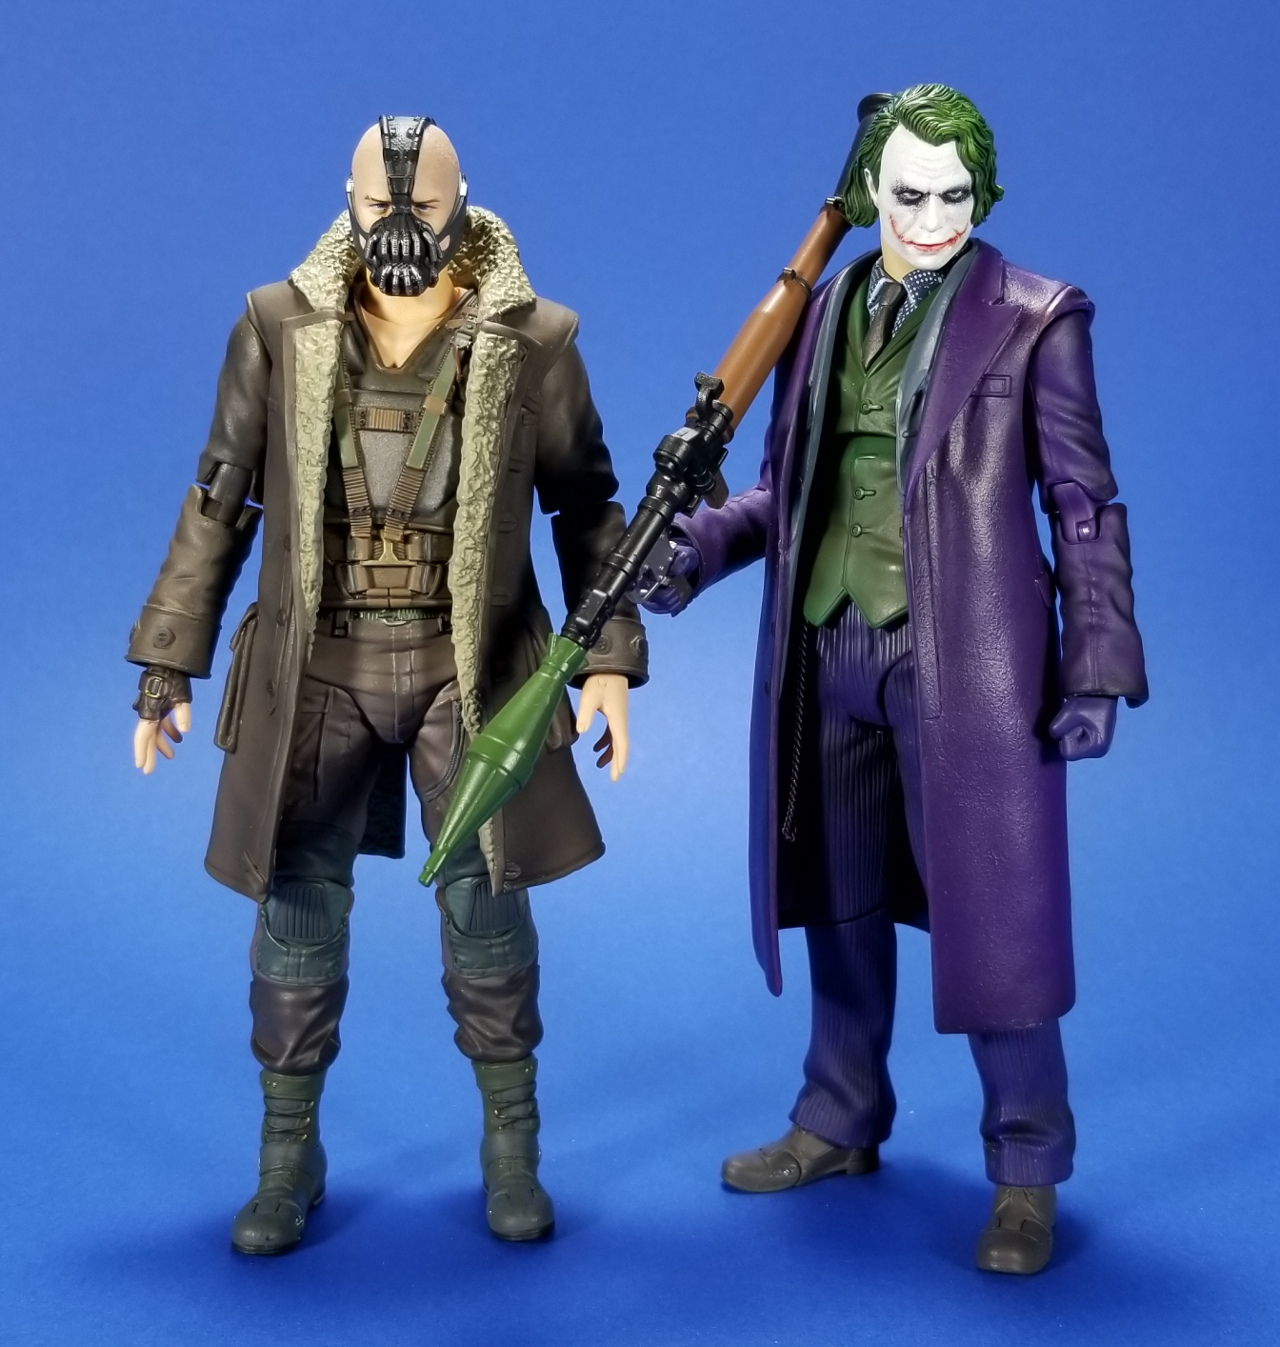 Mafex no 052 Bane Batman The Dark Knight Rises Action Figurine Medicom